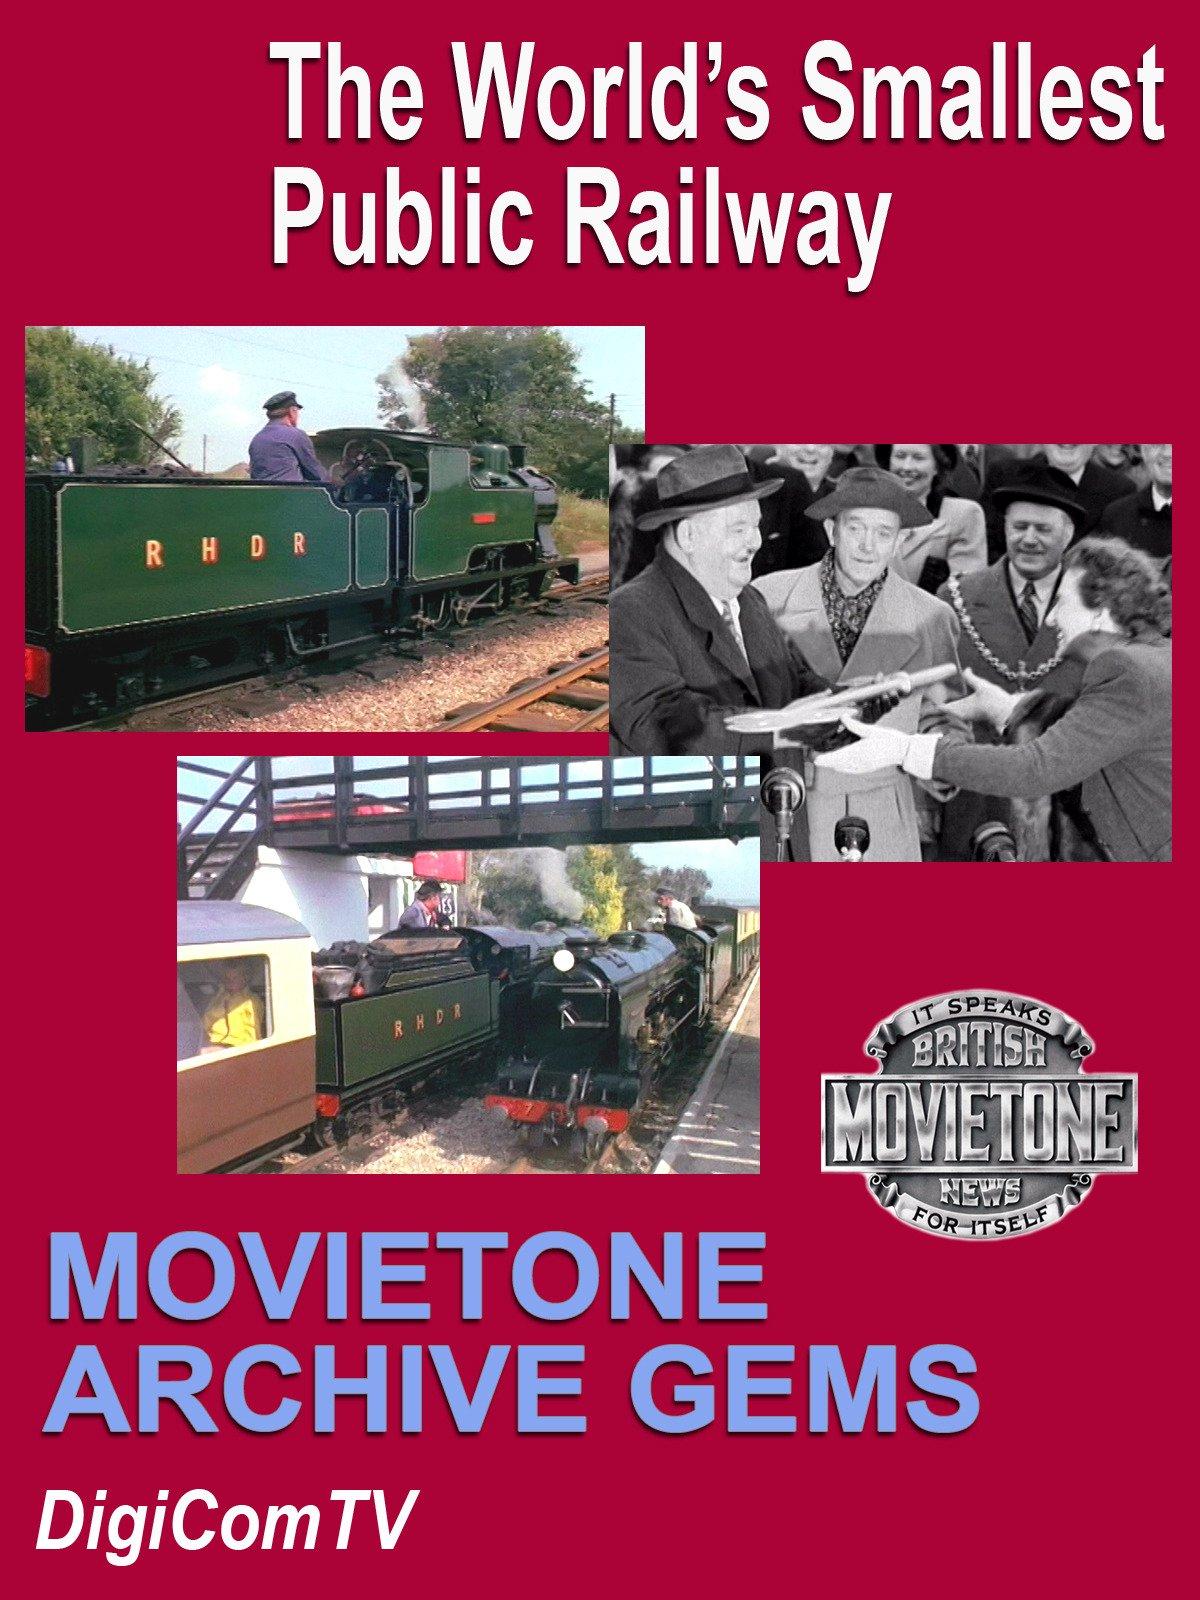 Movietone Archive Gems - The World's Smallest Public Railway on Amazon Prime Video UK